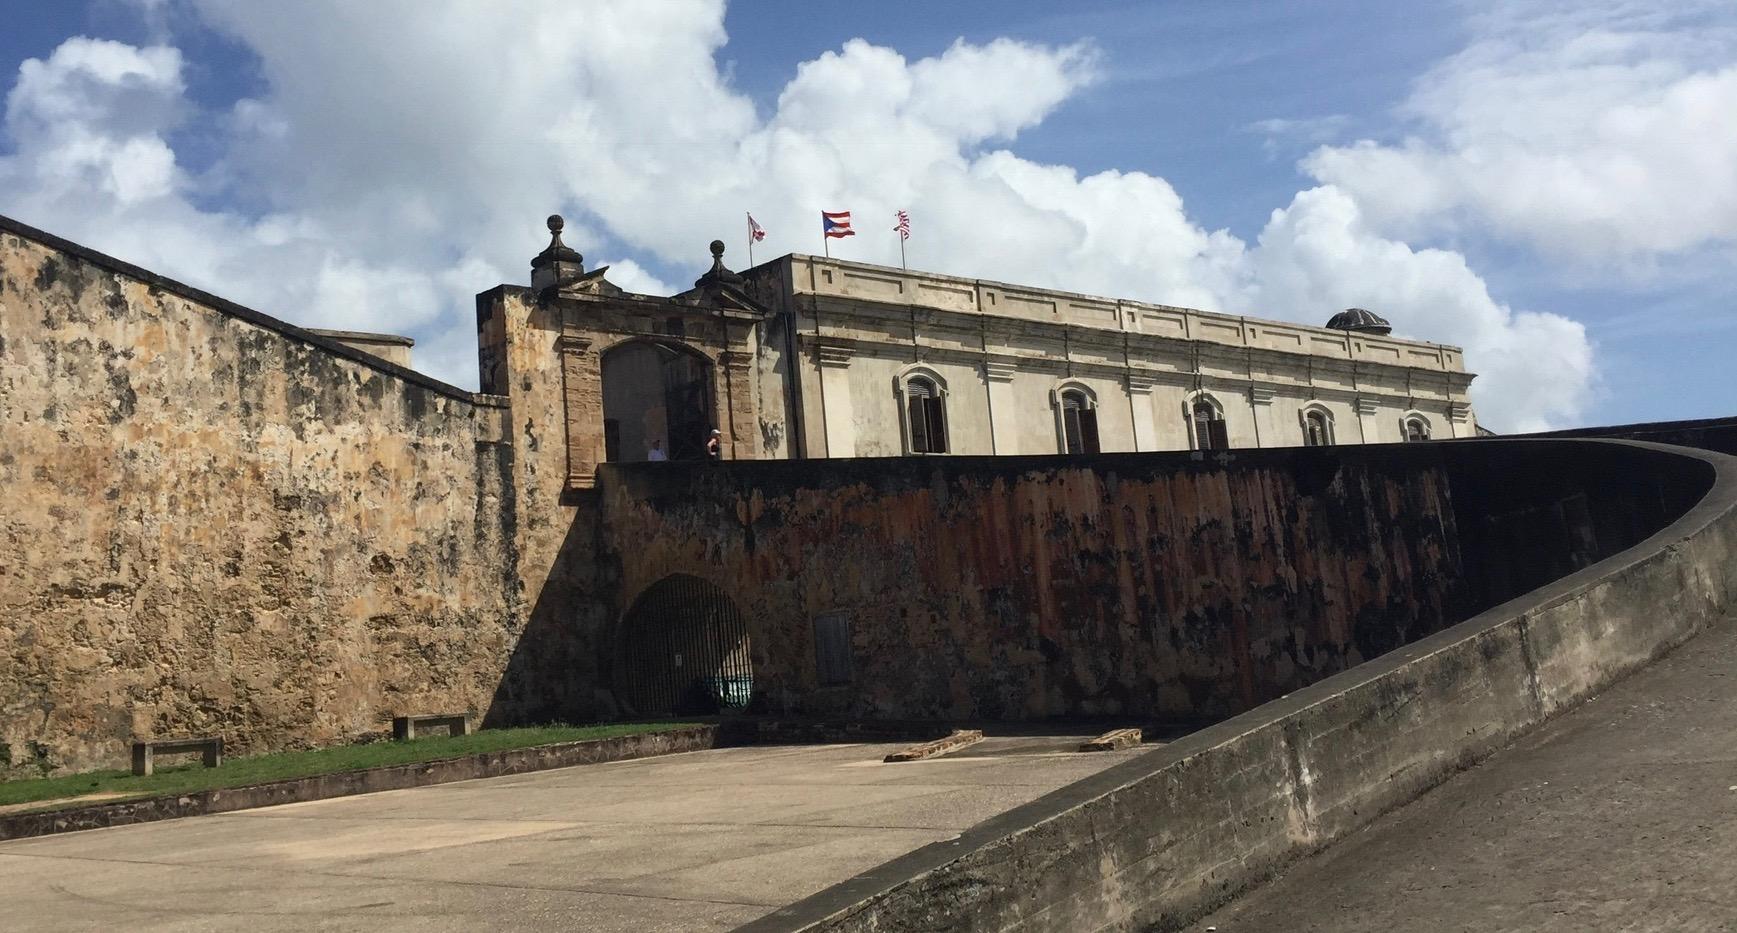 puerto rico statehood?